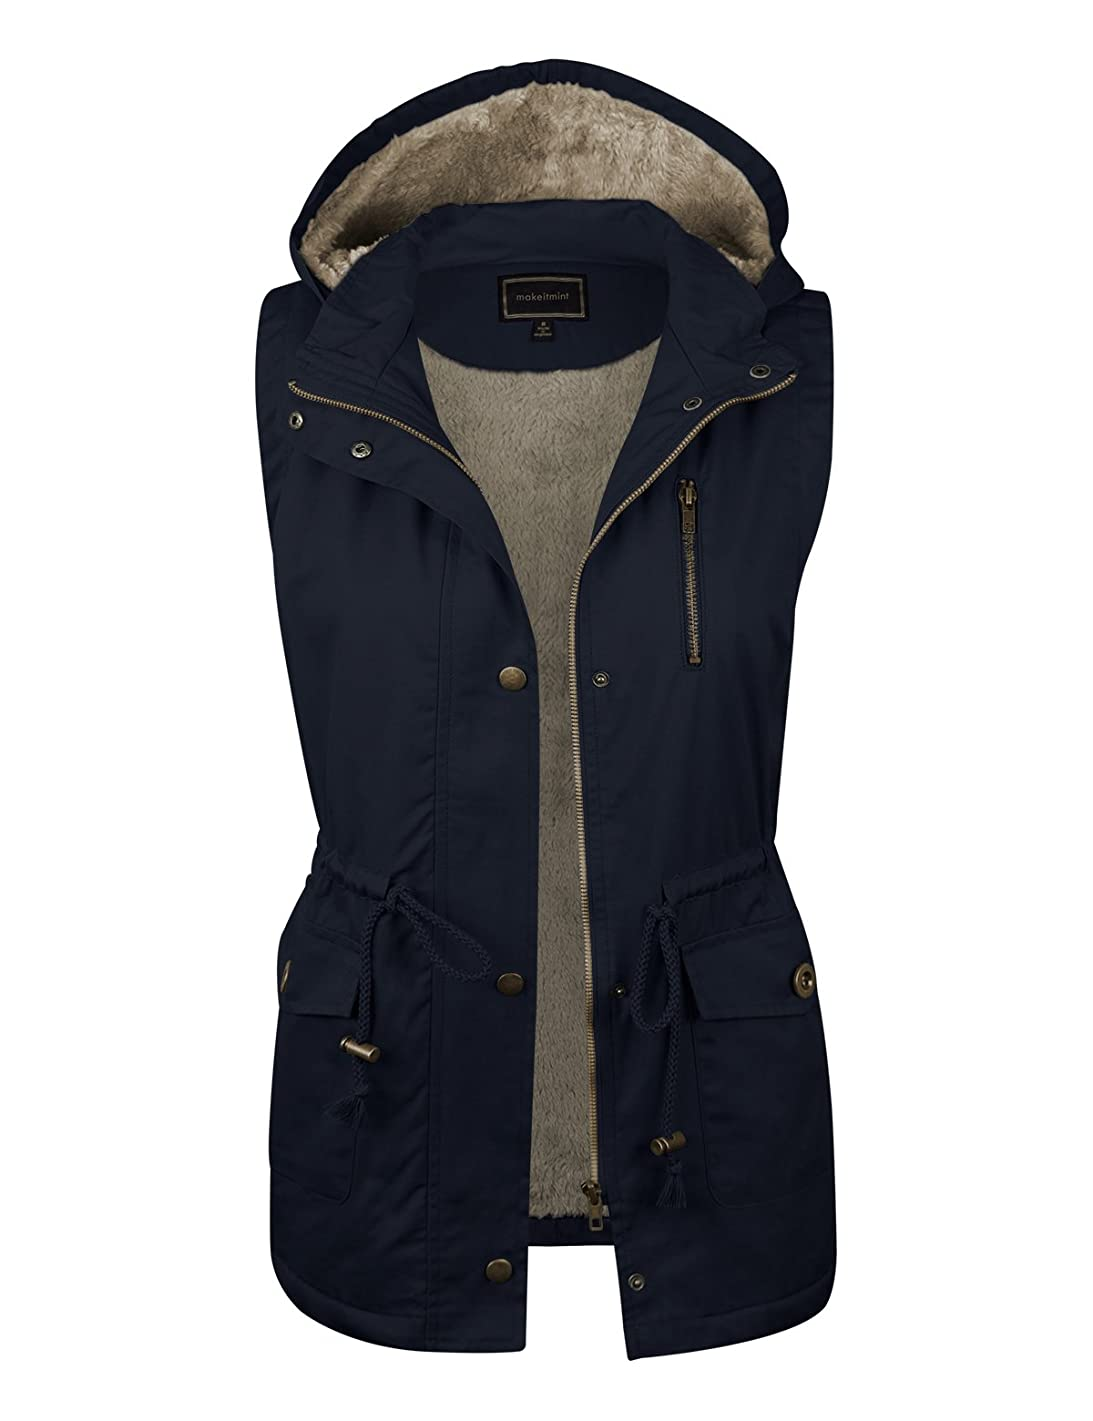 makeitmint Women's Soft Faux Fur Lined Anorak Utility Hooded Jacket Vest [S-3XL] FBA-YJV0018-34NAVY-2XL